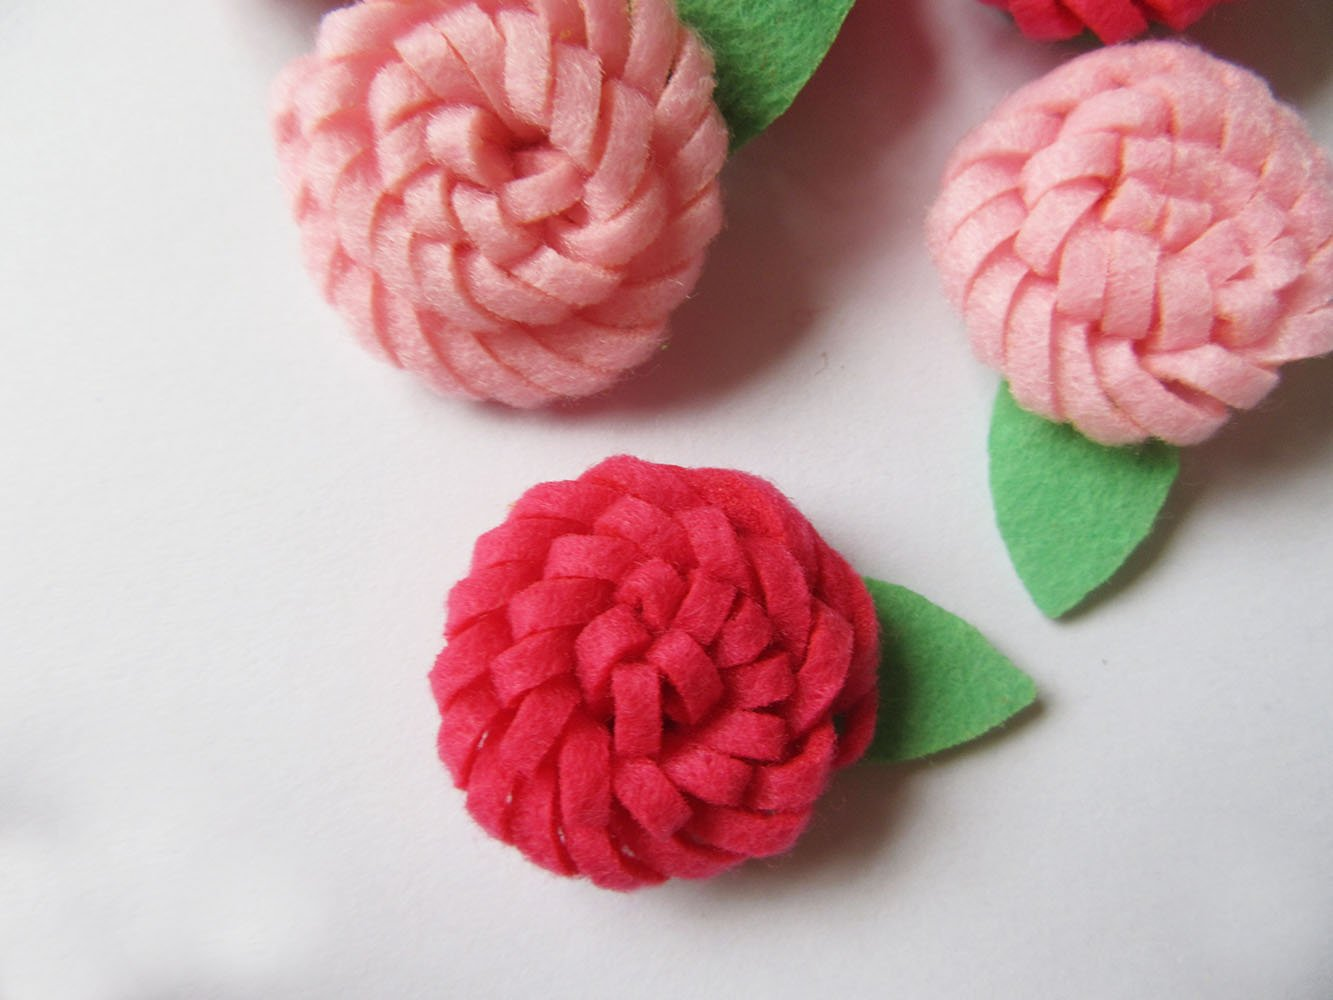 Yycraft pacco da pezzi feltro rosa cm d applique fiore